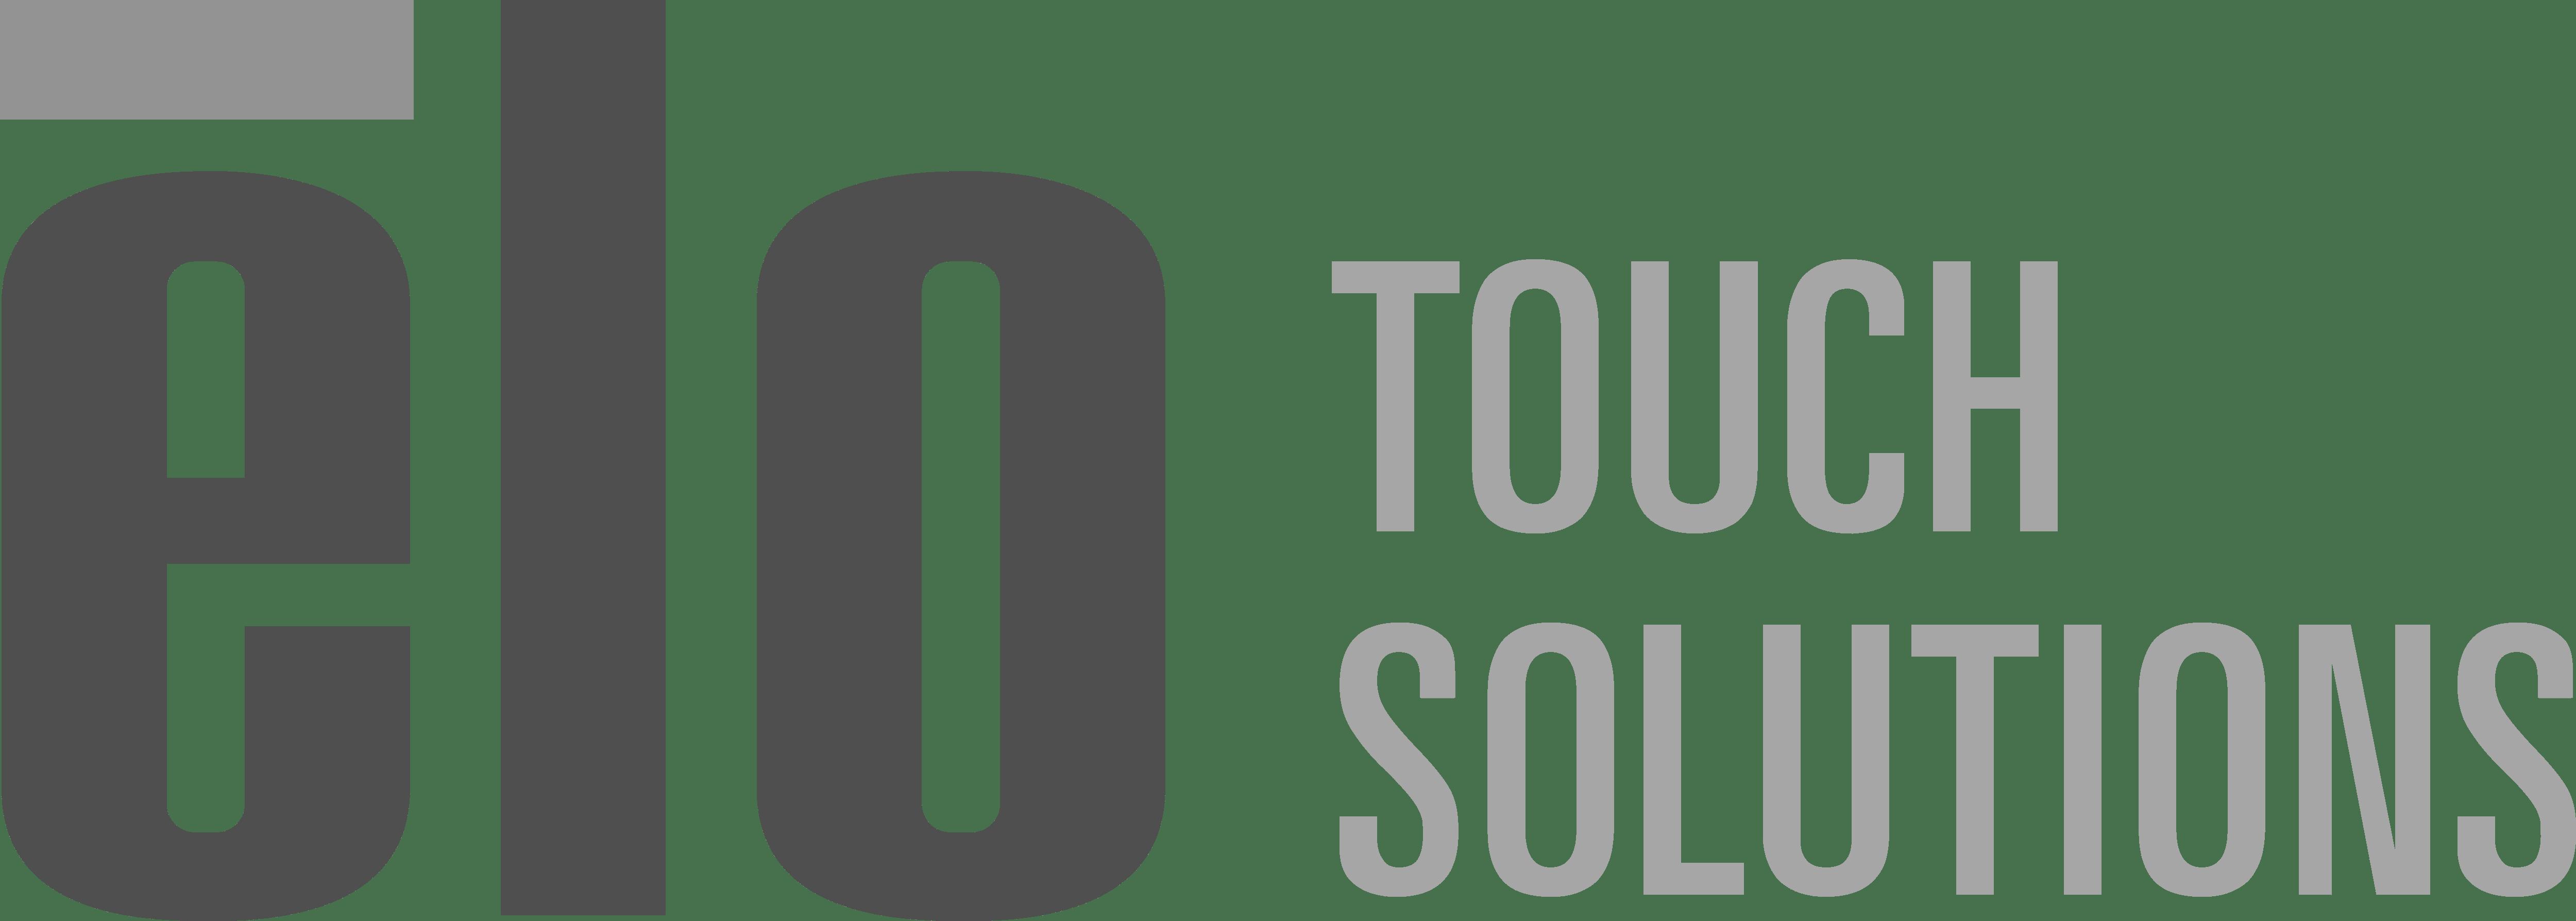 ELOTouchSolutions (gris)